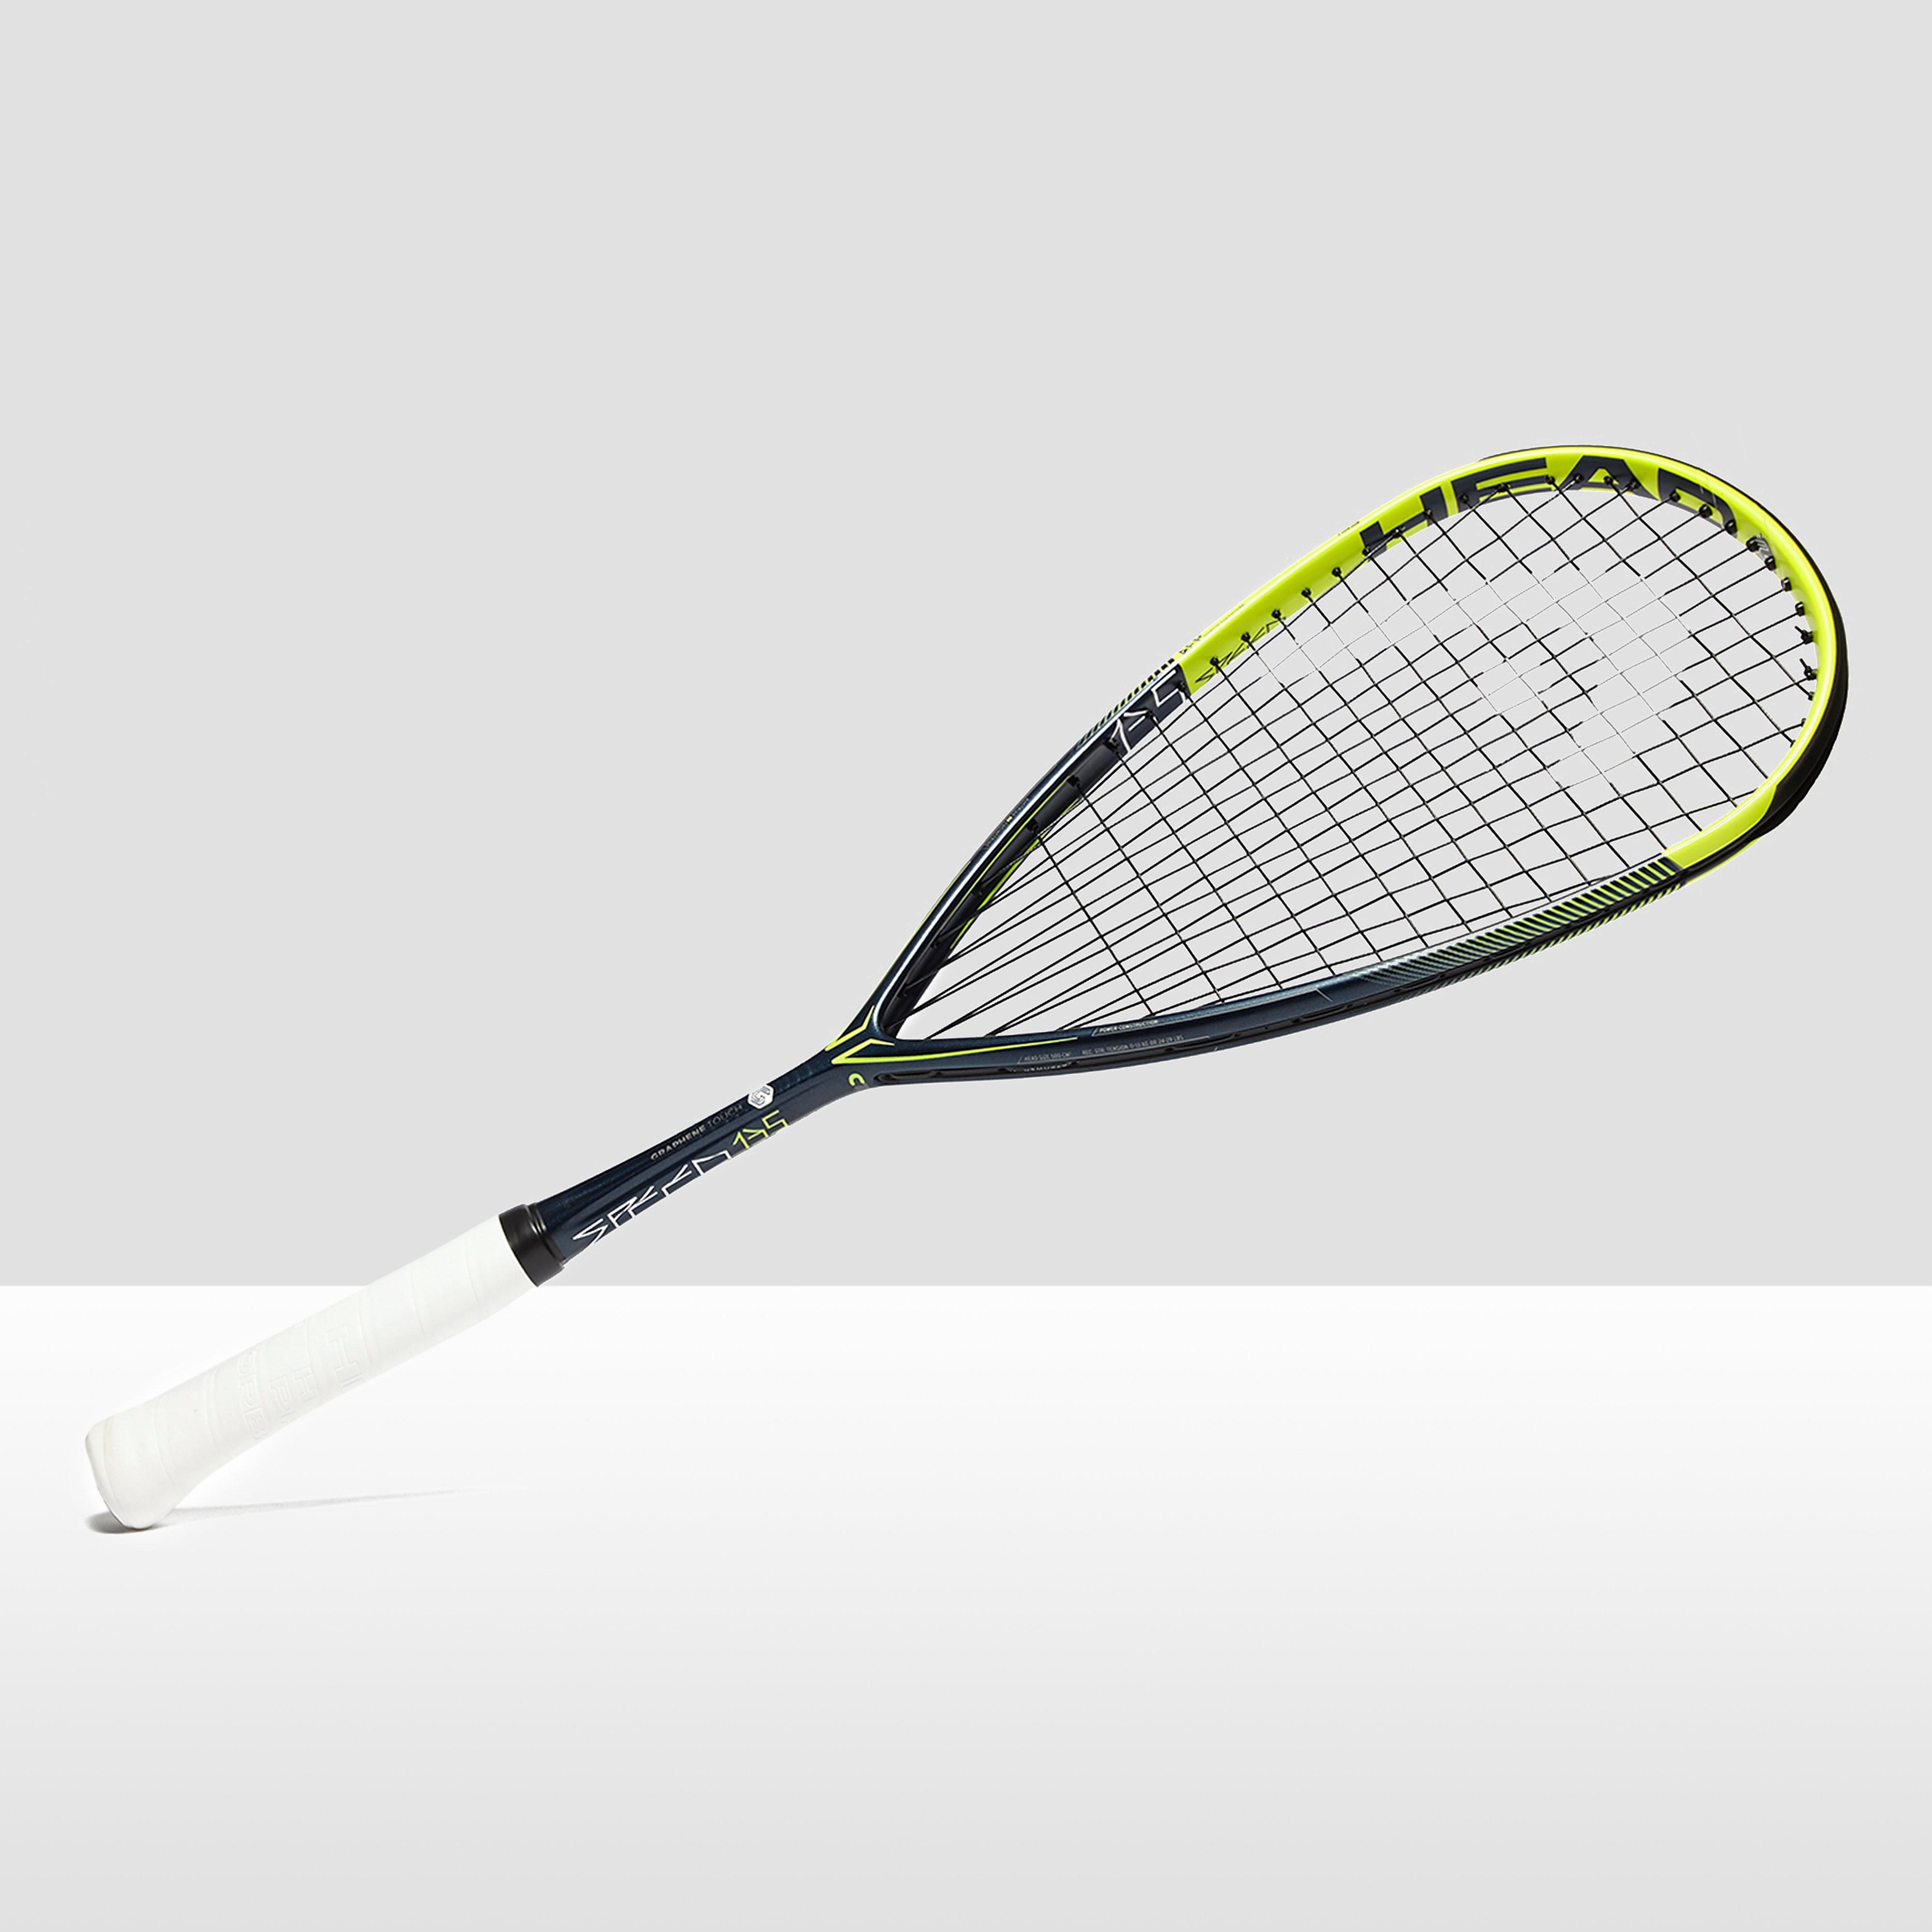 Head Graphene Touch Speed 135 Squash Racket